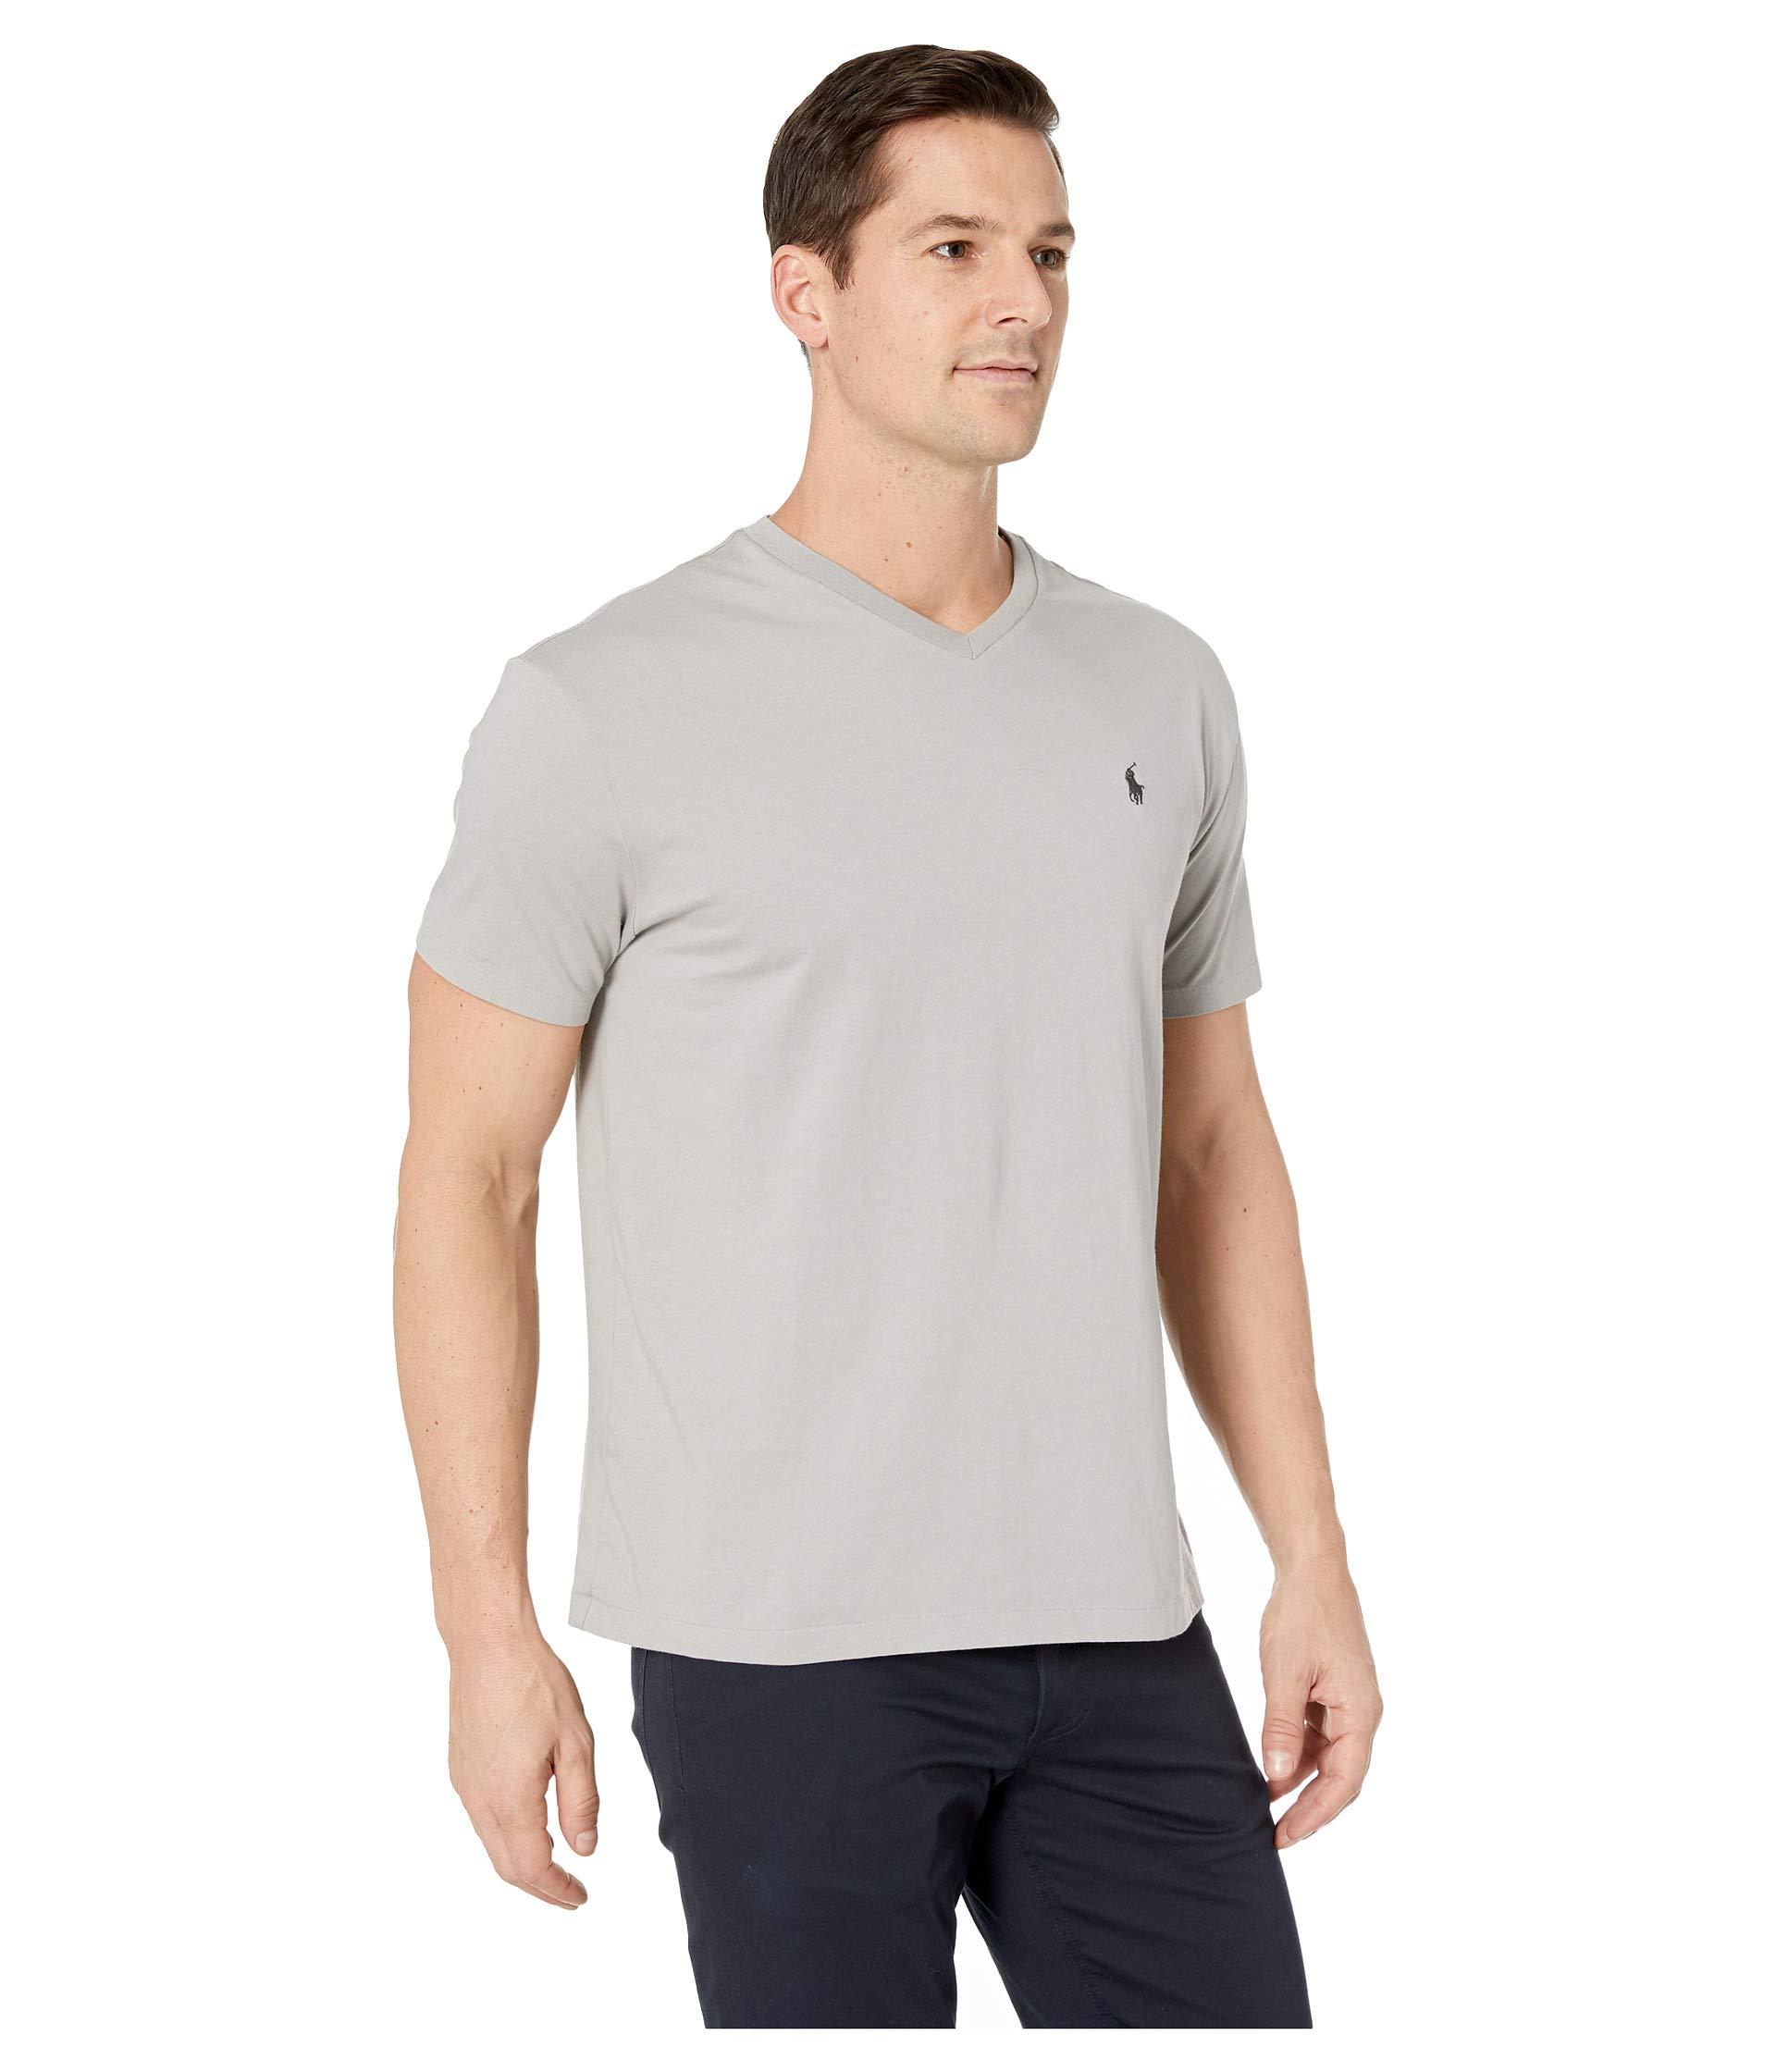 Polo V 26 Sleeve Soft Grey 1 Classic Lauren Fit T neck Jersey Short Ralph shirt xTTwZrC